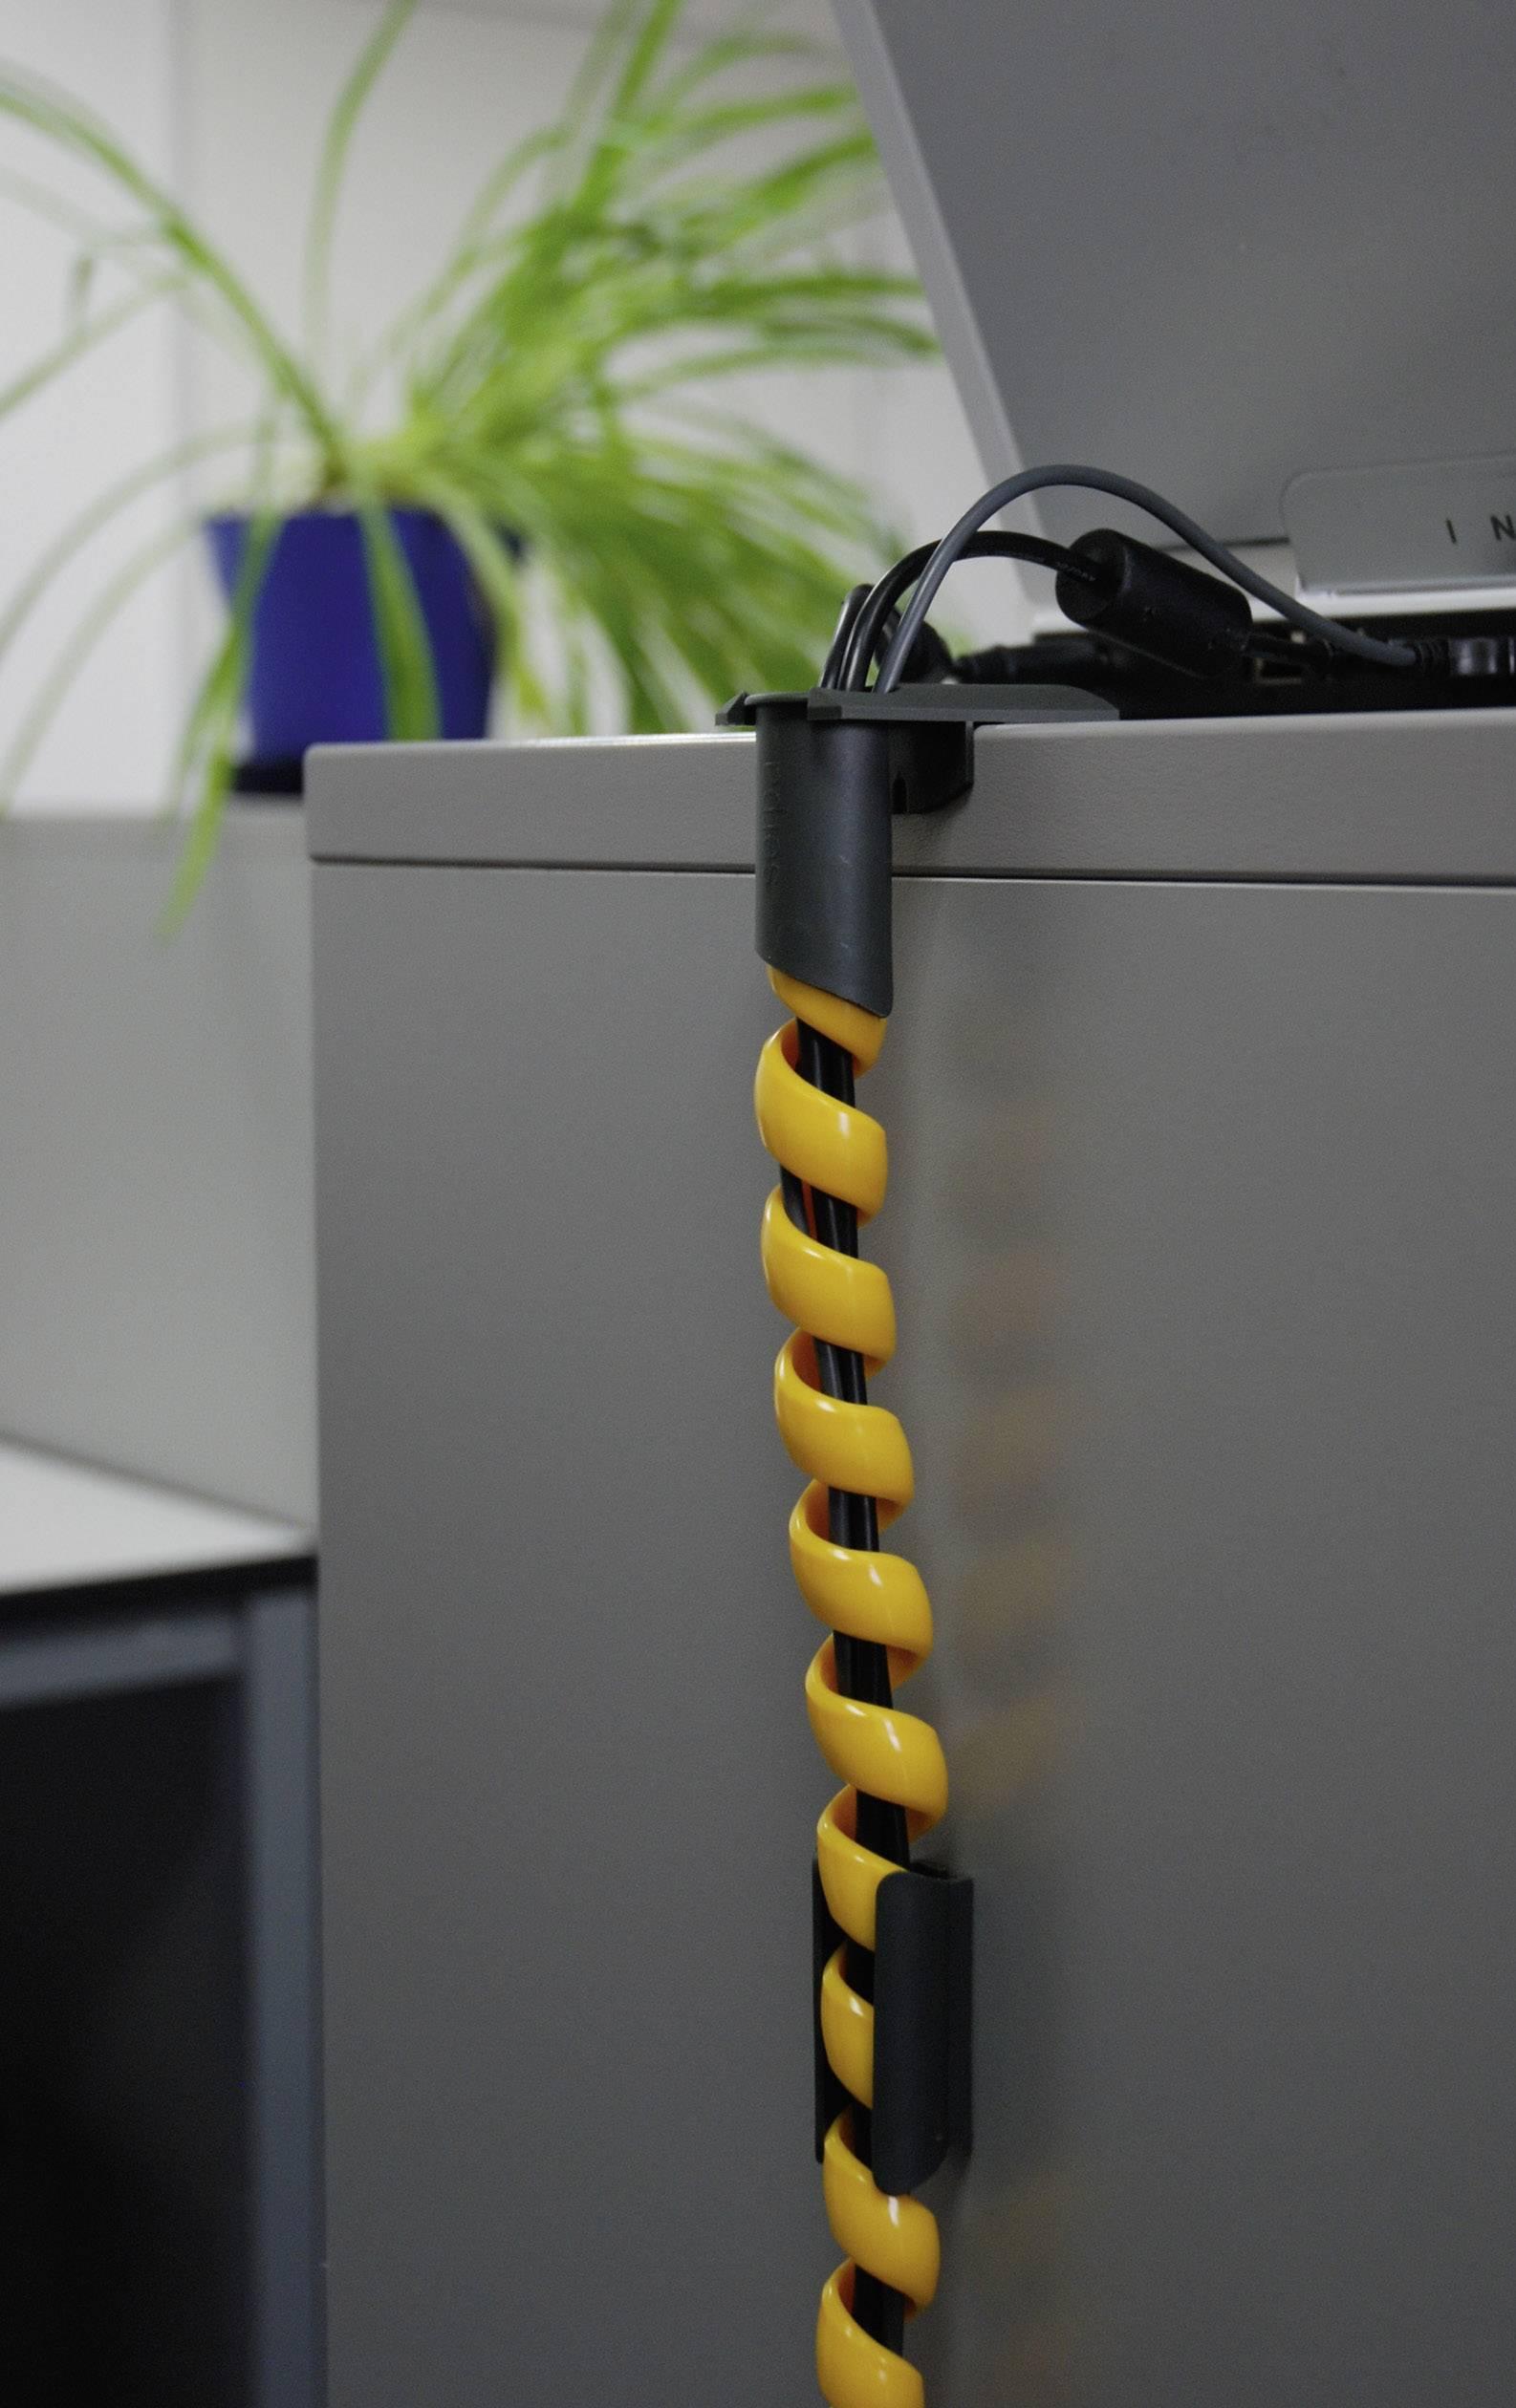 Spirálový kabelový oplet Serpa 5.04003.1028 15 mm, žlutá, 1 sada